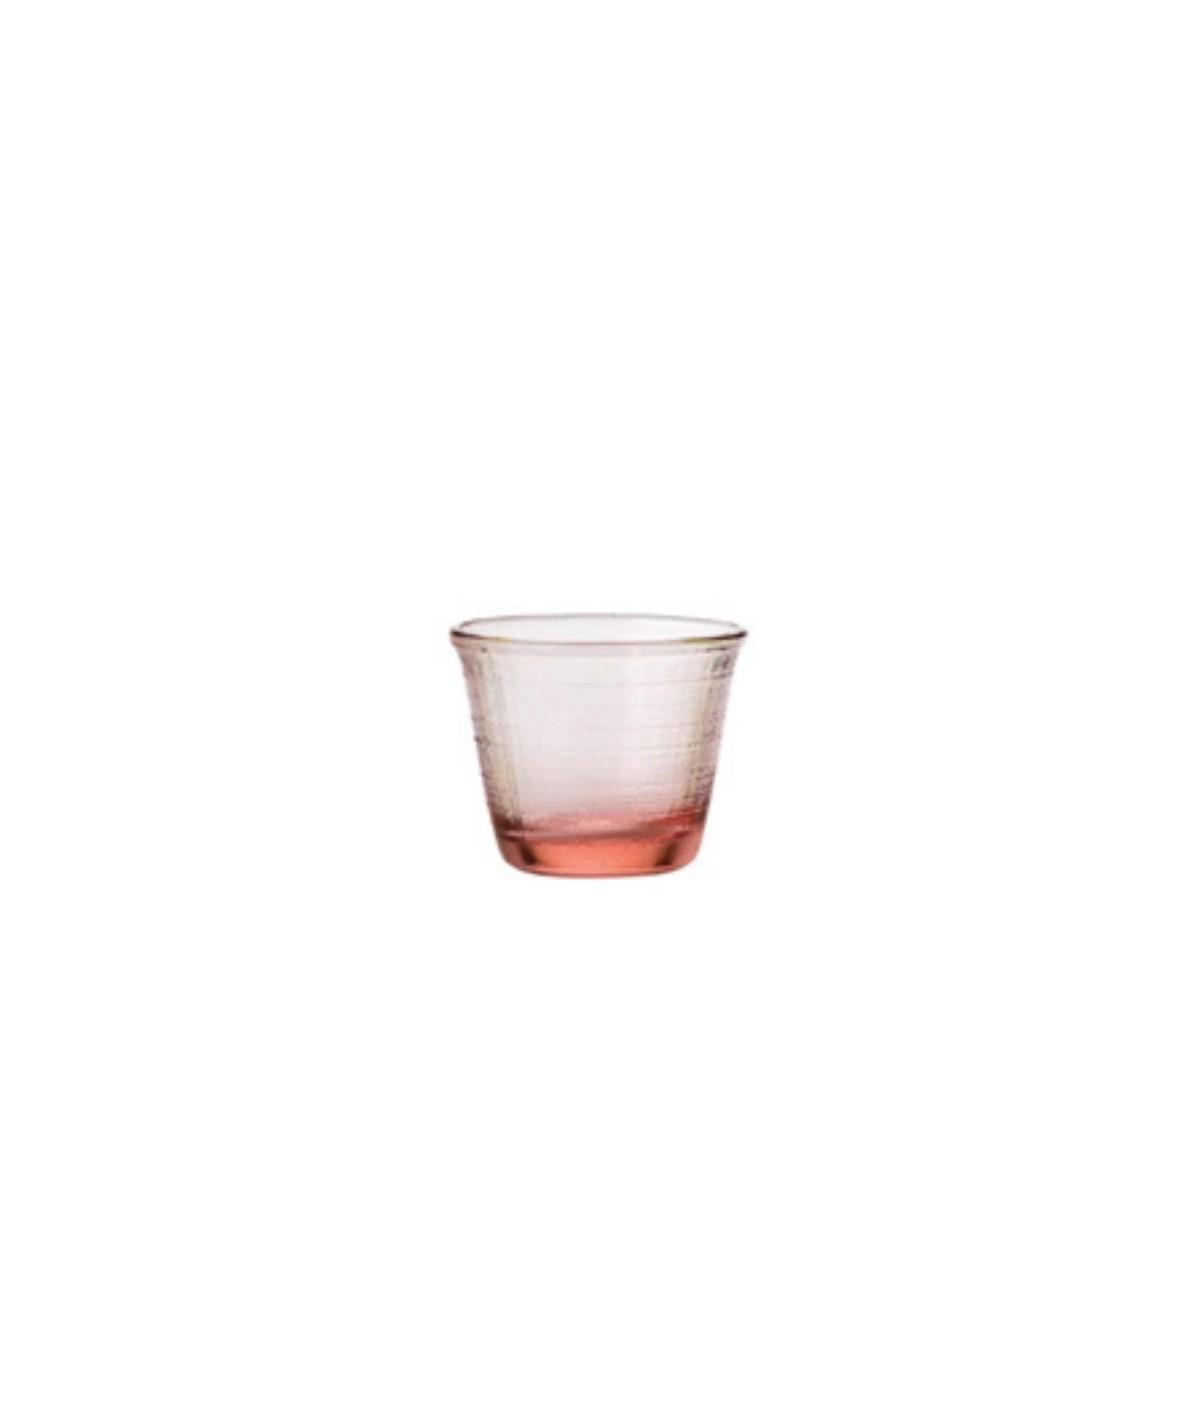 Bicchiere rosso in vetro Denim set 6 pezzi - Every Day